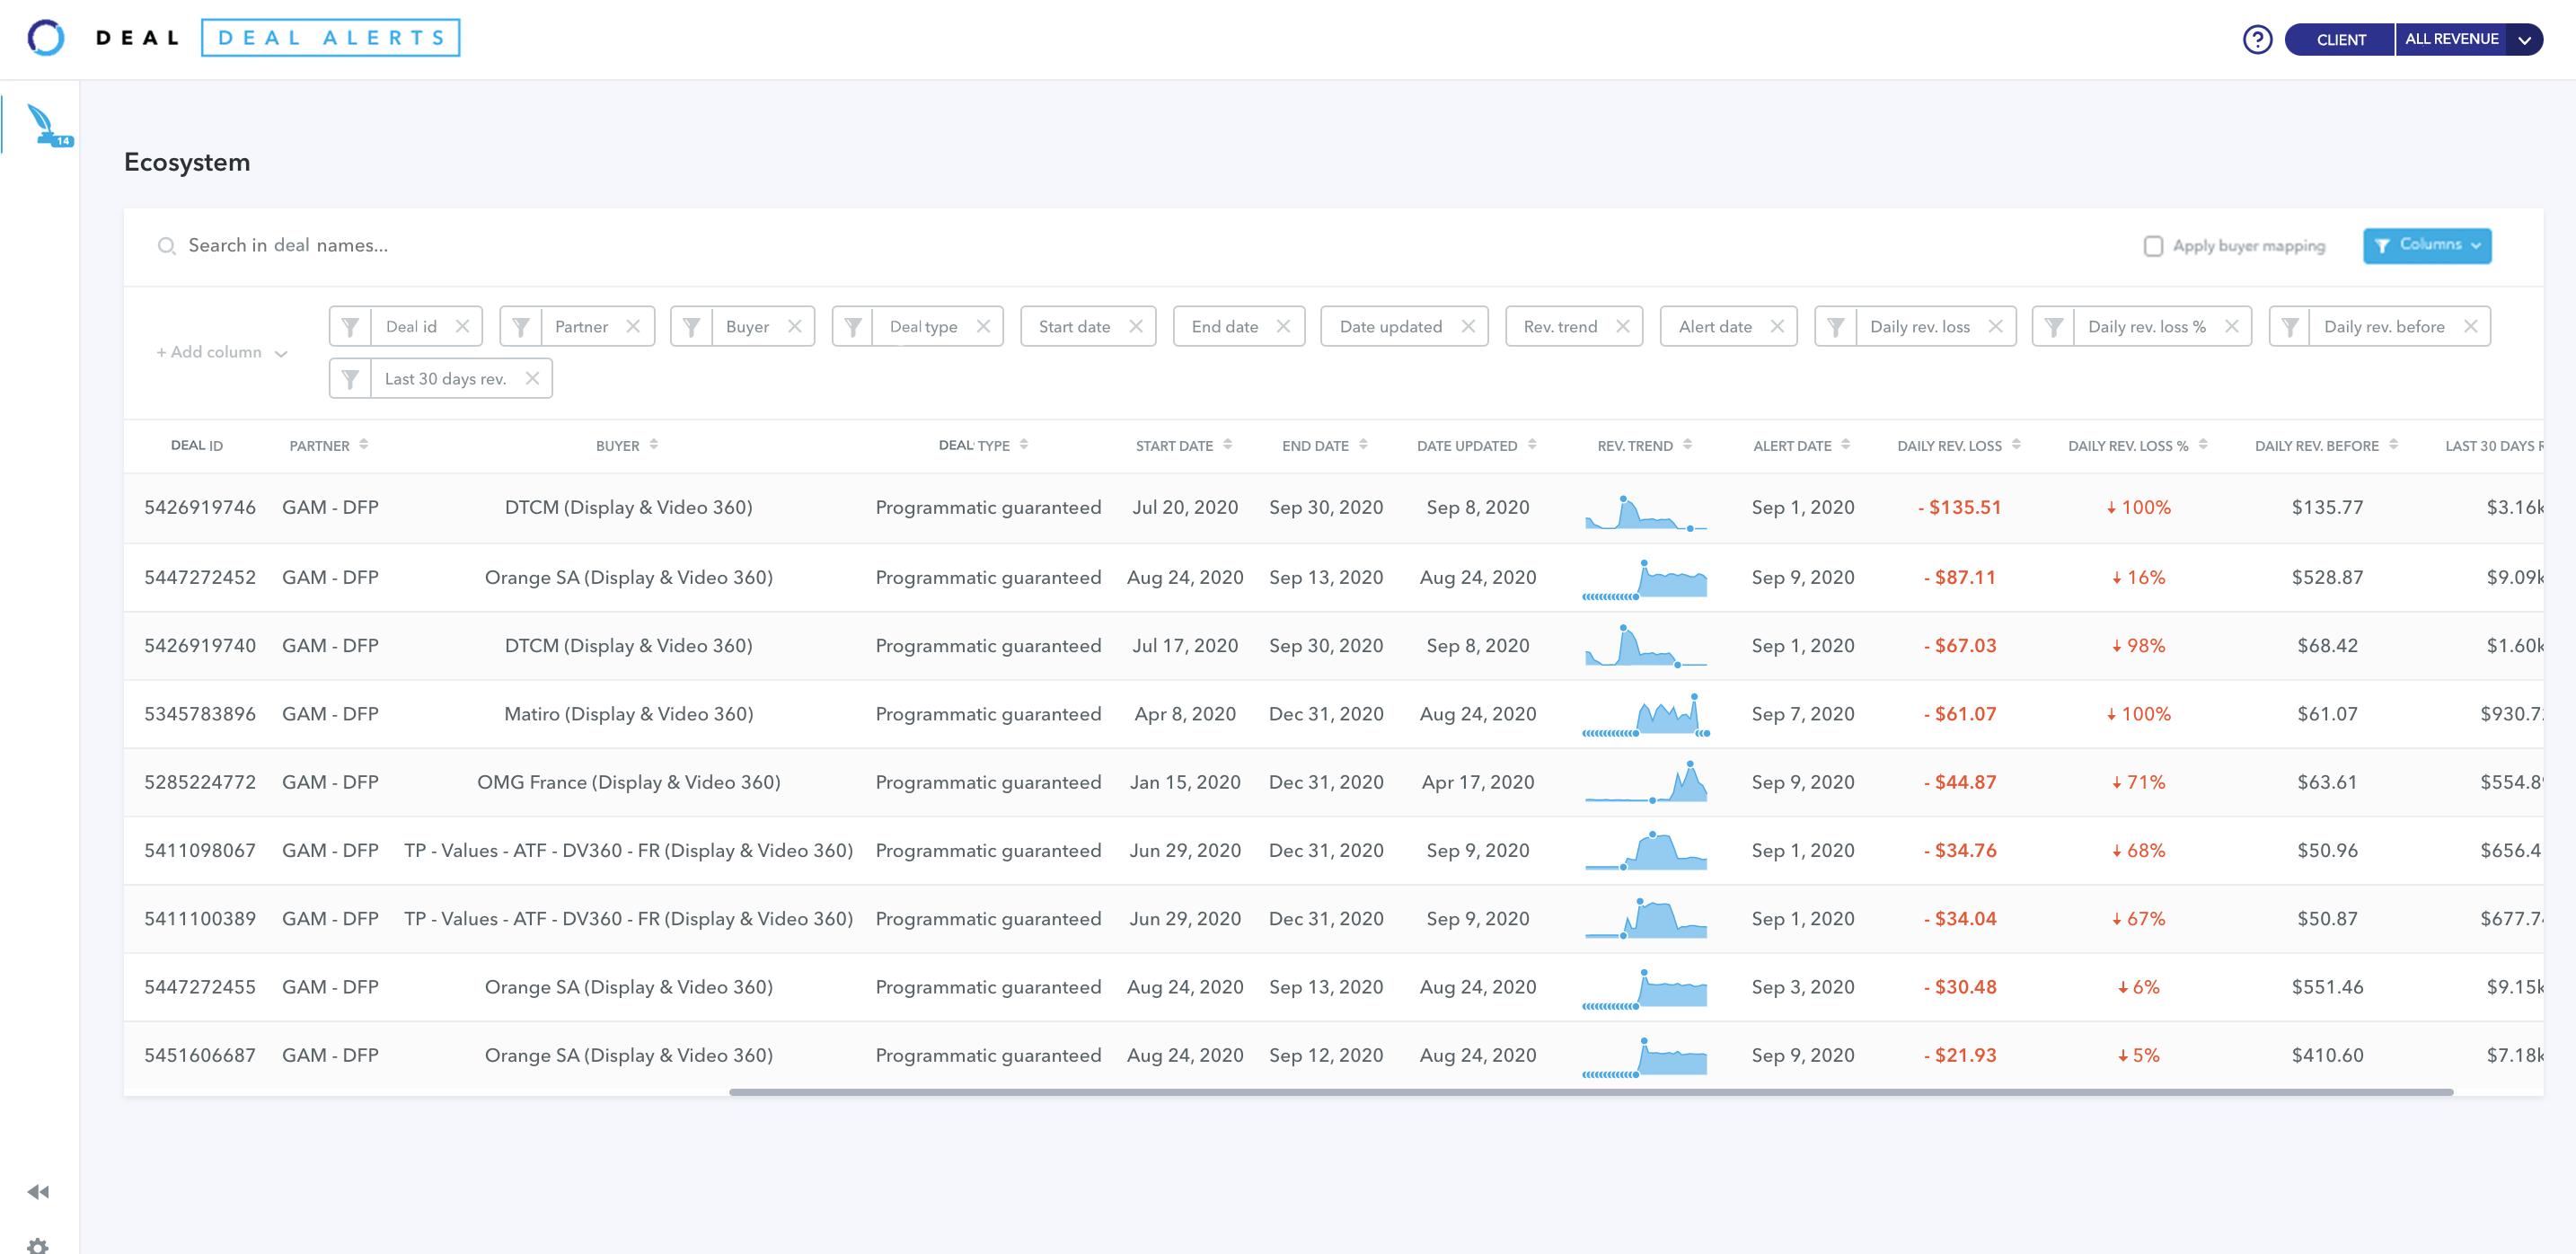 Adomik Deal - Deal Alerts UI